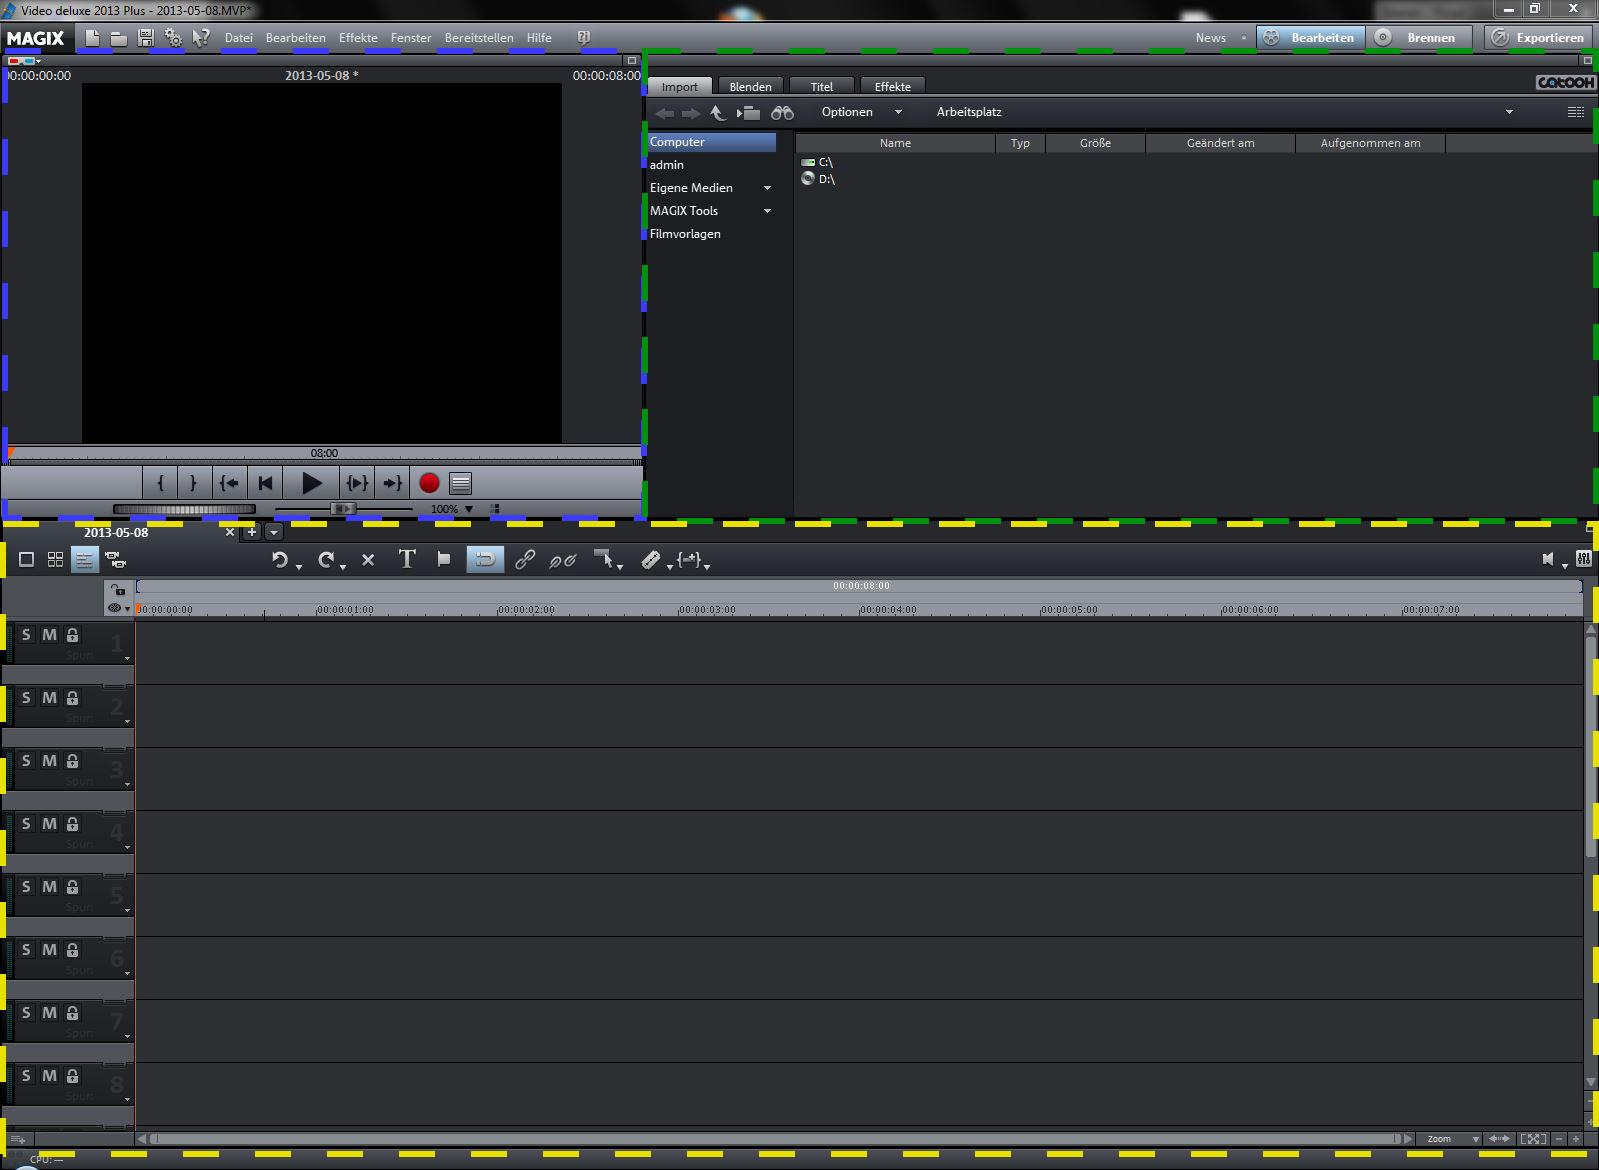 Benutzoberfläche Video Delxe 2013